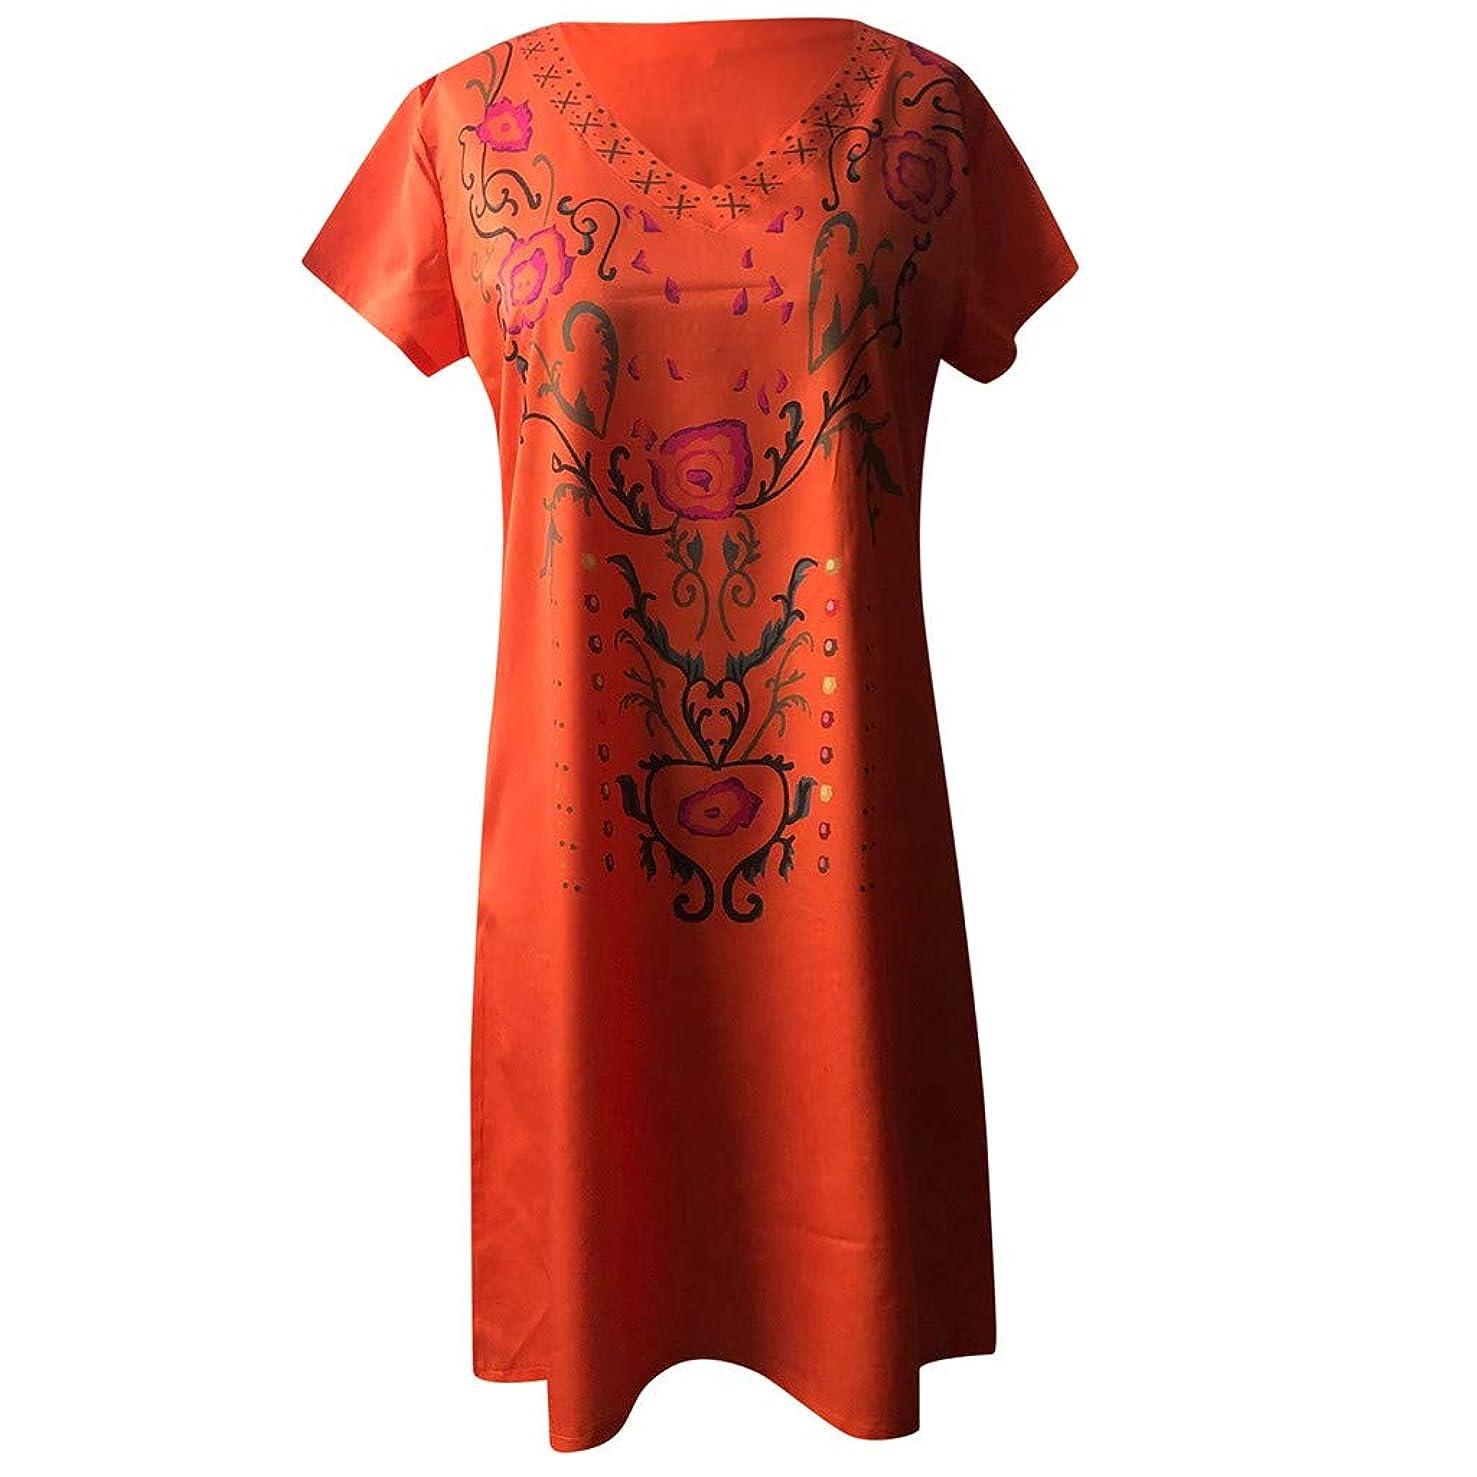 Tantisy ??? Women's Vintage V-Neck Short Sleeve Dress Chic Print Fashion Midi Dress Summer Casual Flowy Swing Dress